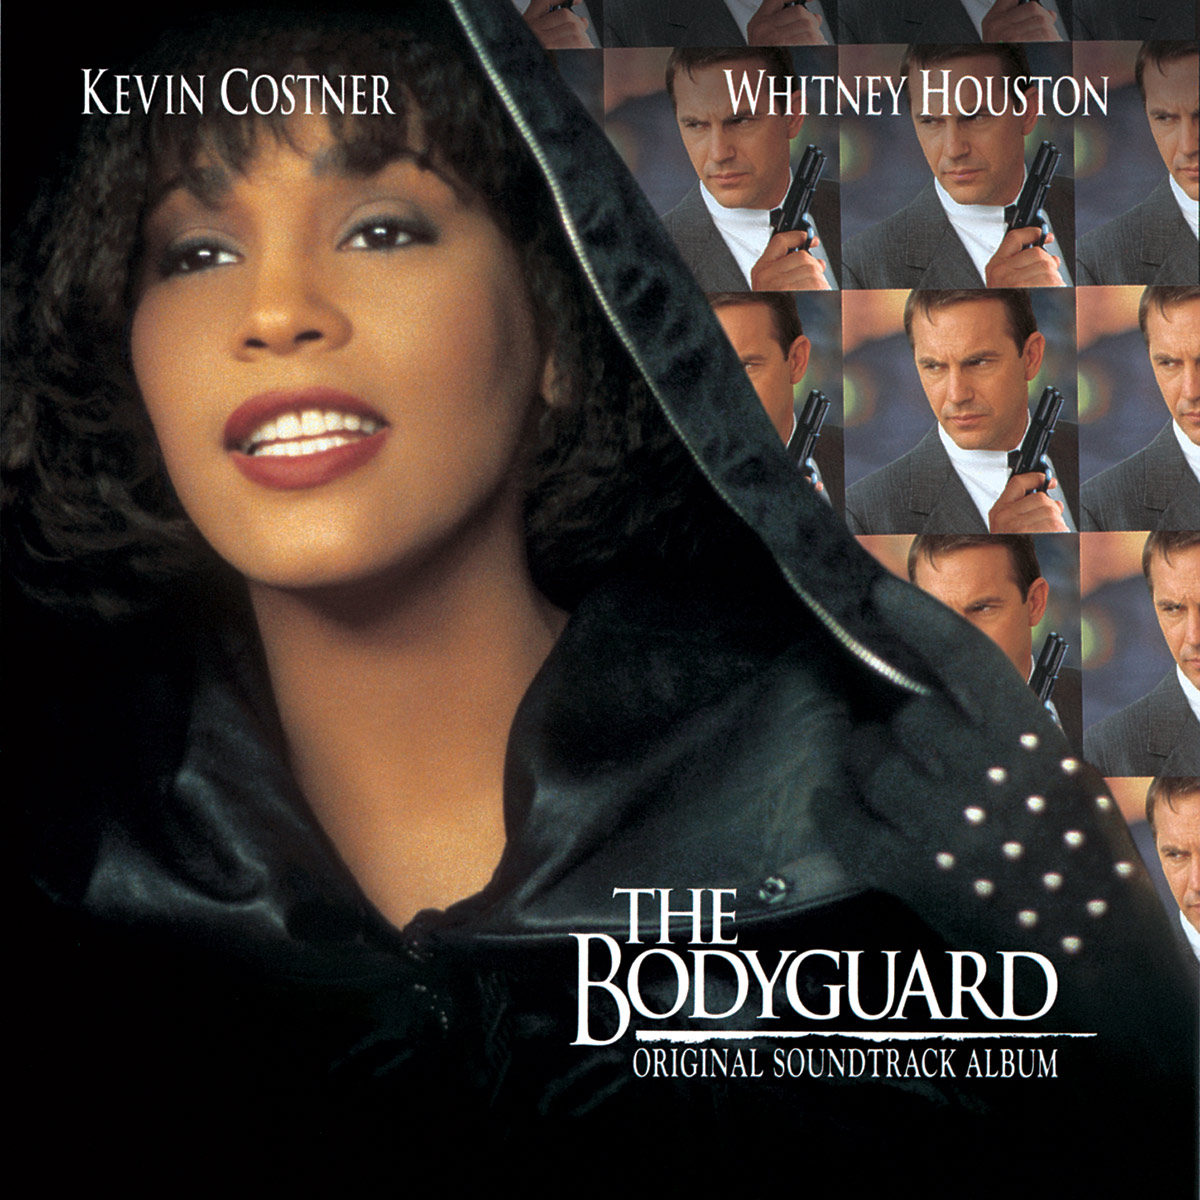 The Bodyguard Original Soundtrack Album Whitney Houston Official Site